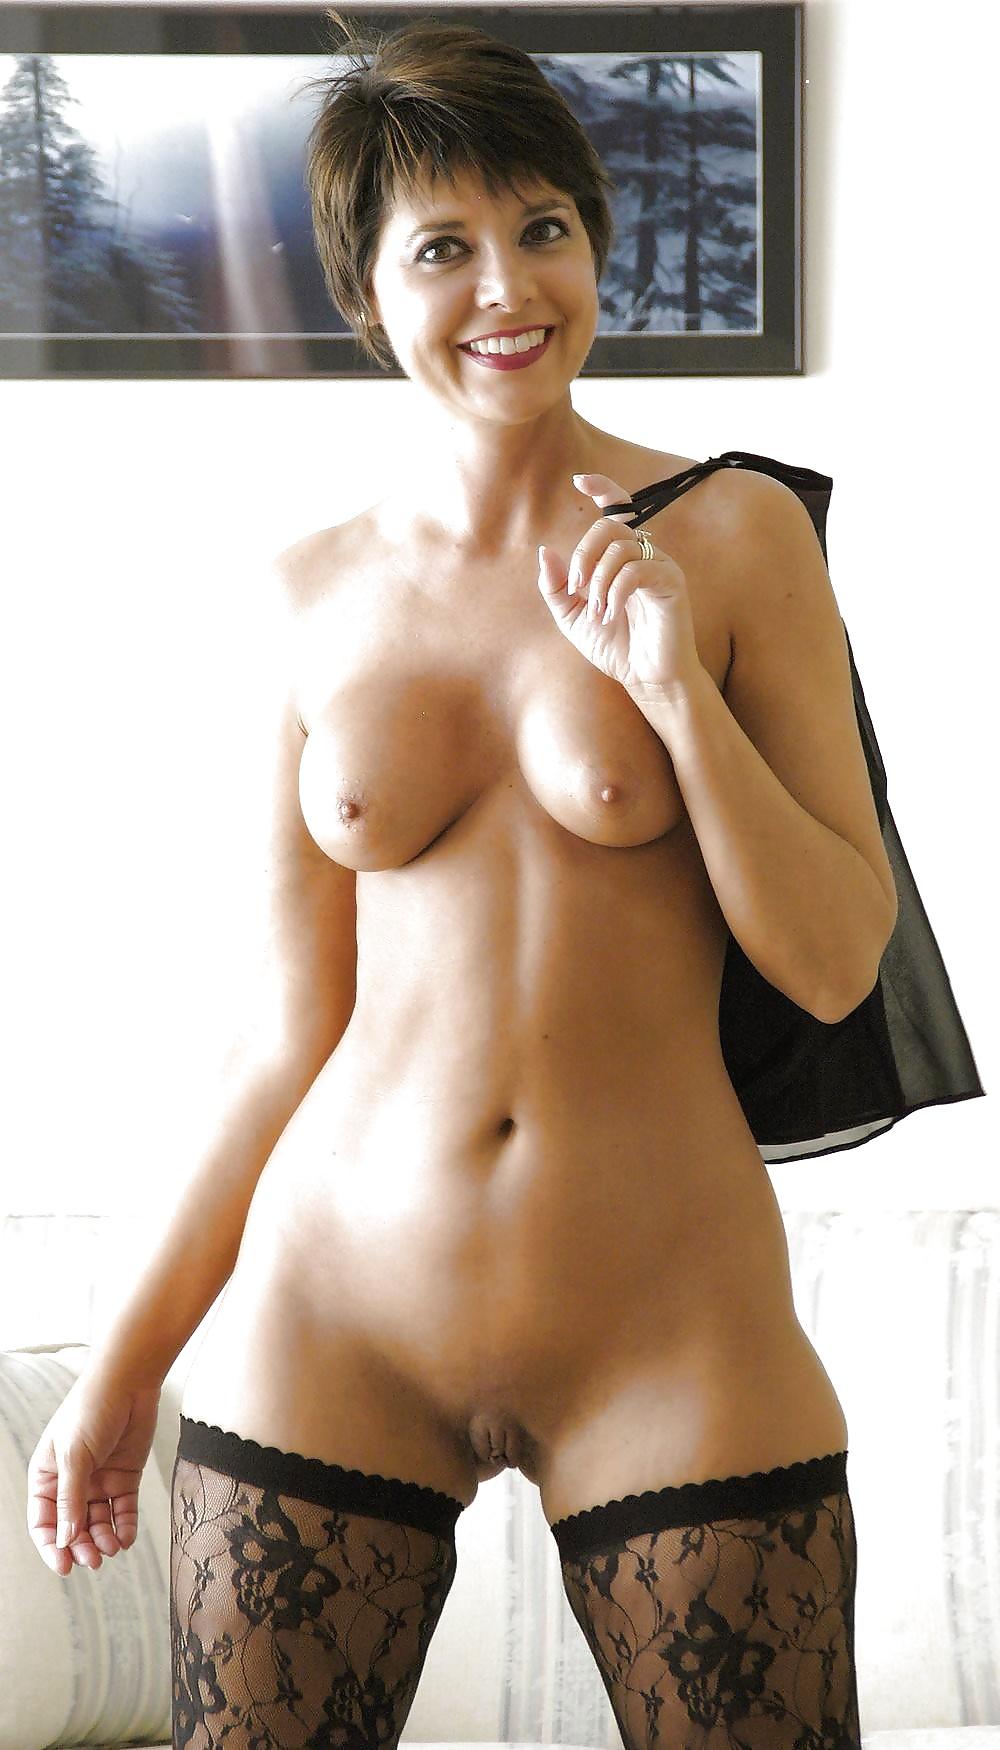 Very short women nude pics free